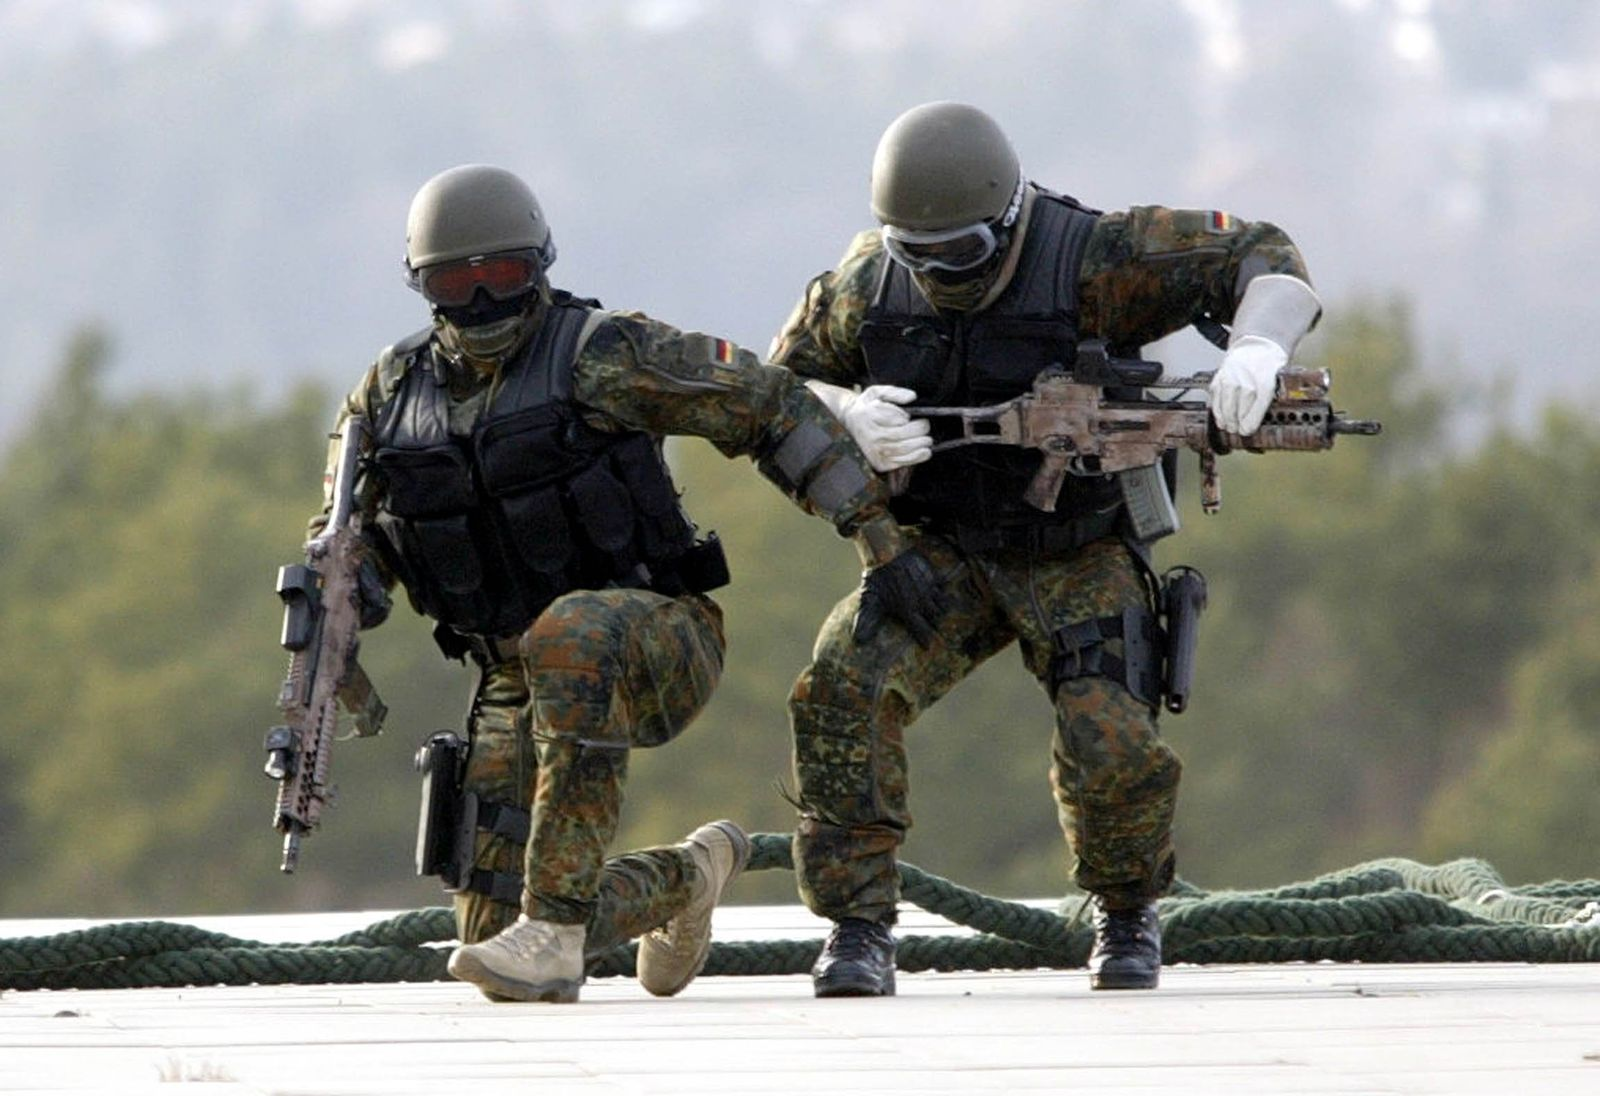 Übung der Kommando Spezialkräfte (KSK)